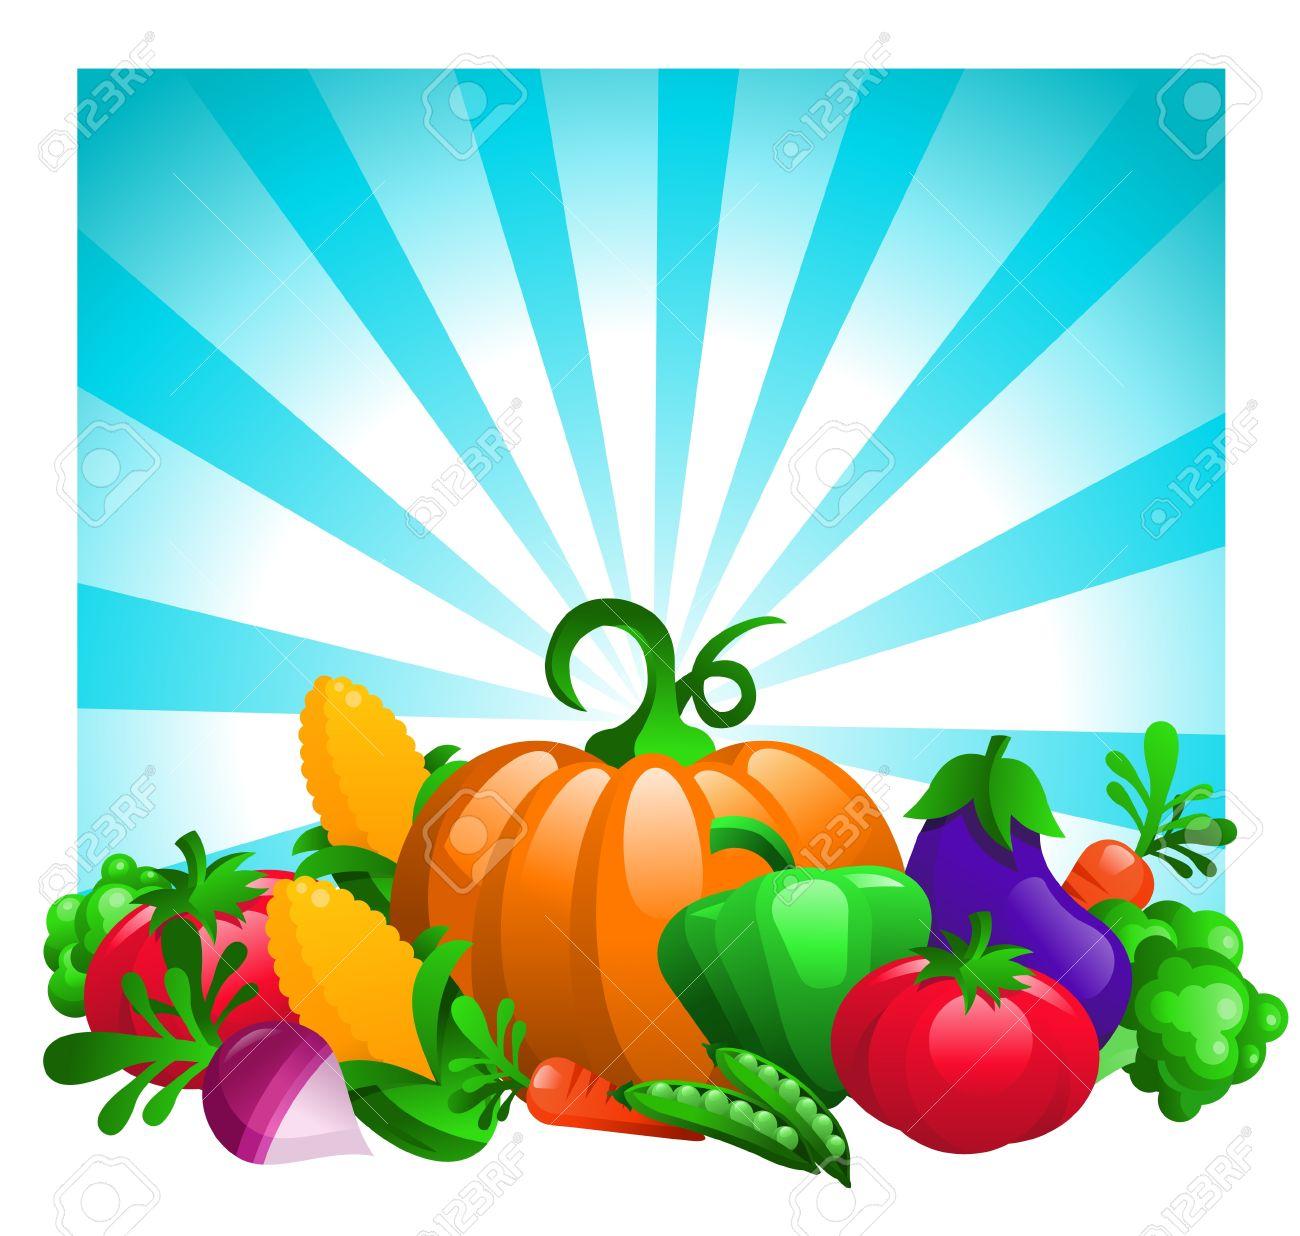 Glossy Vegetables on Bursting Background Stock Vector - 16338214